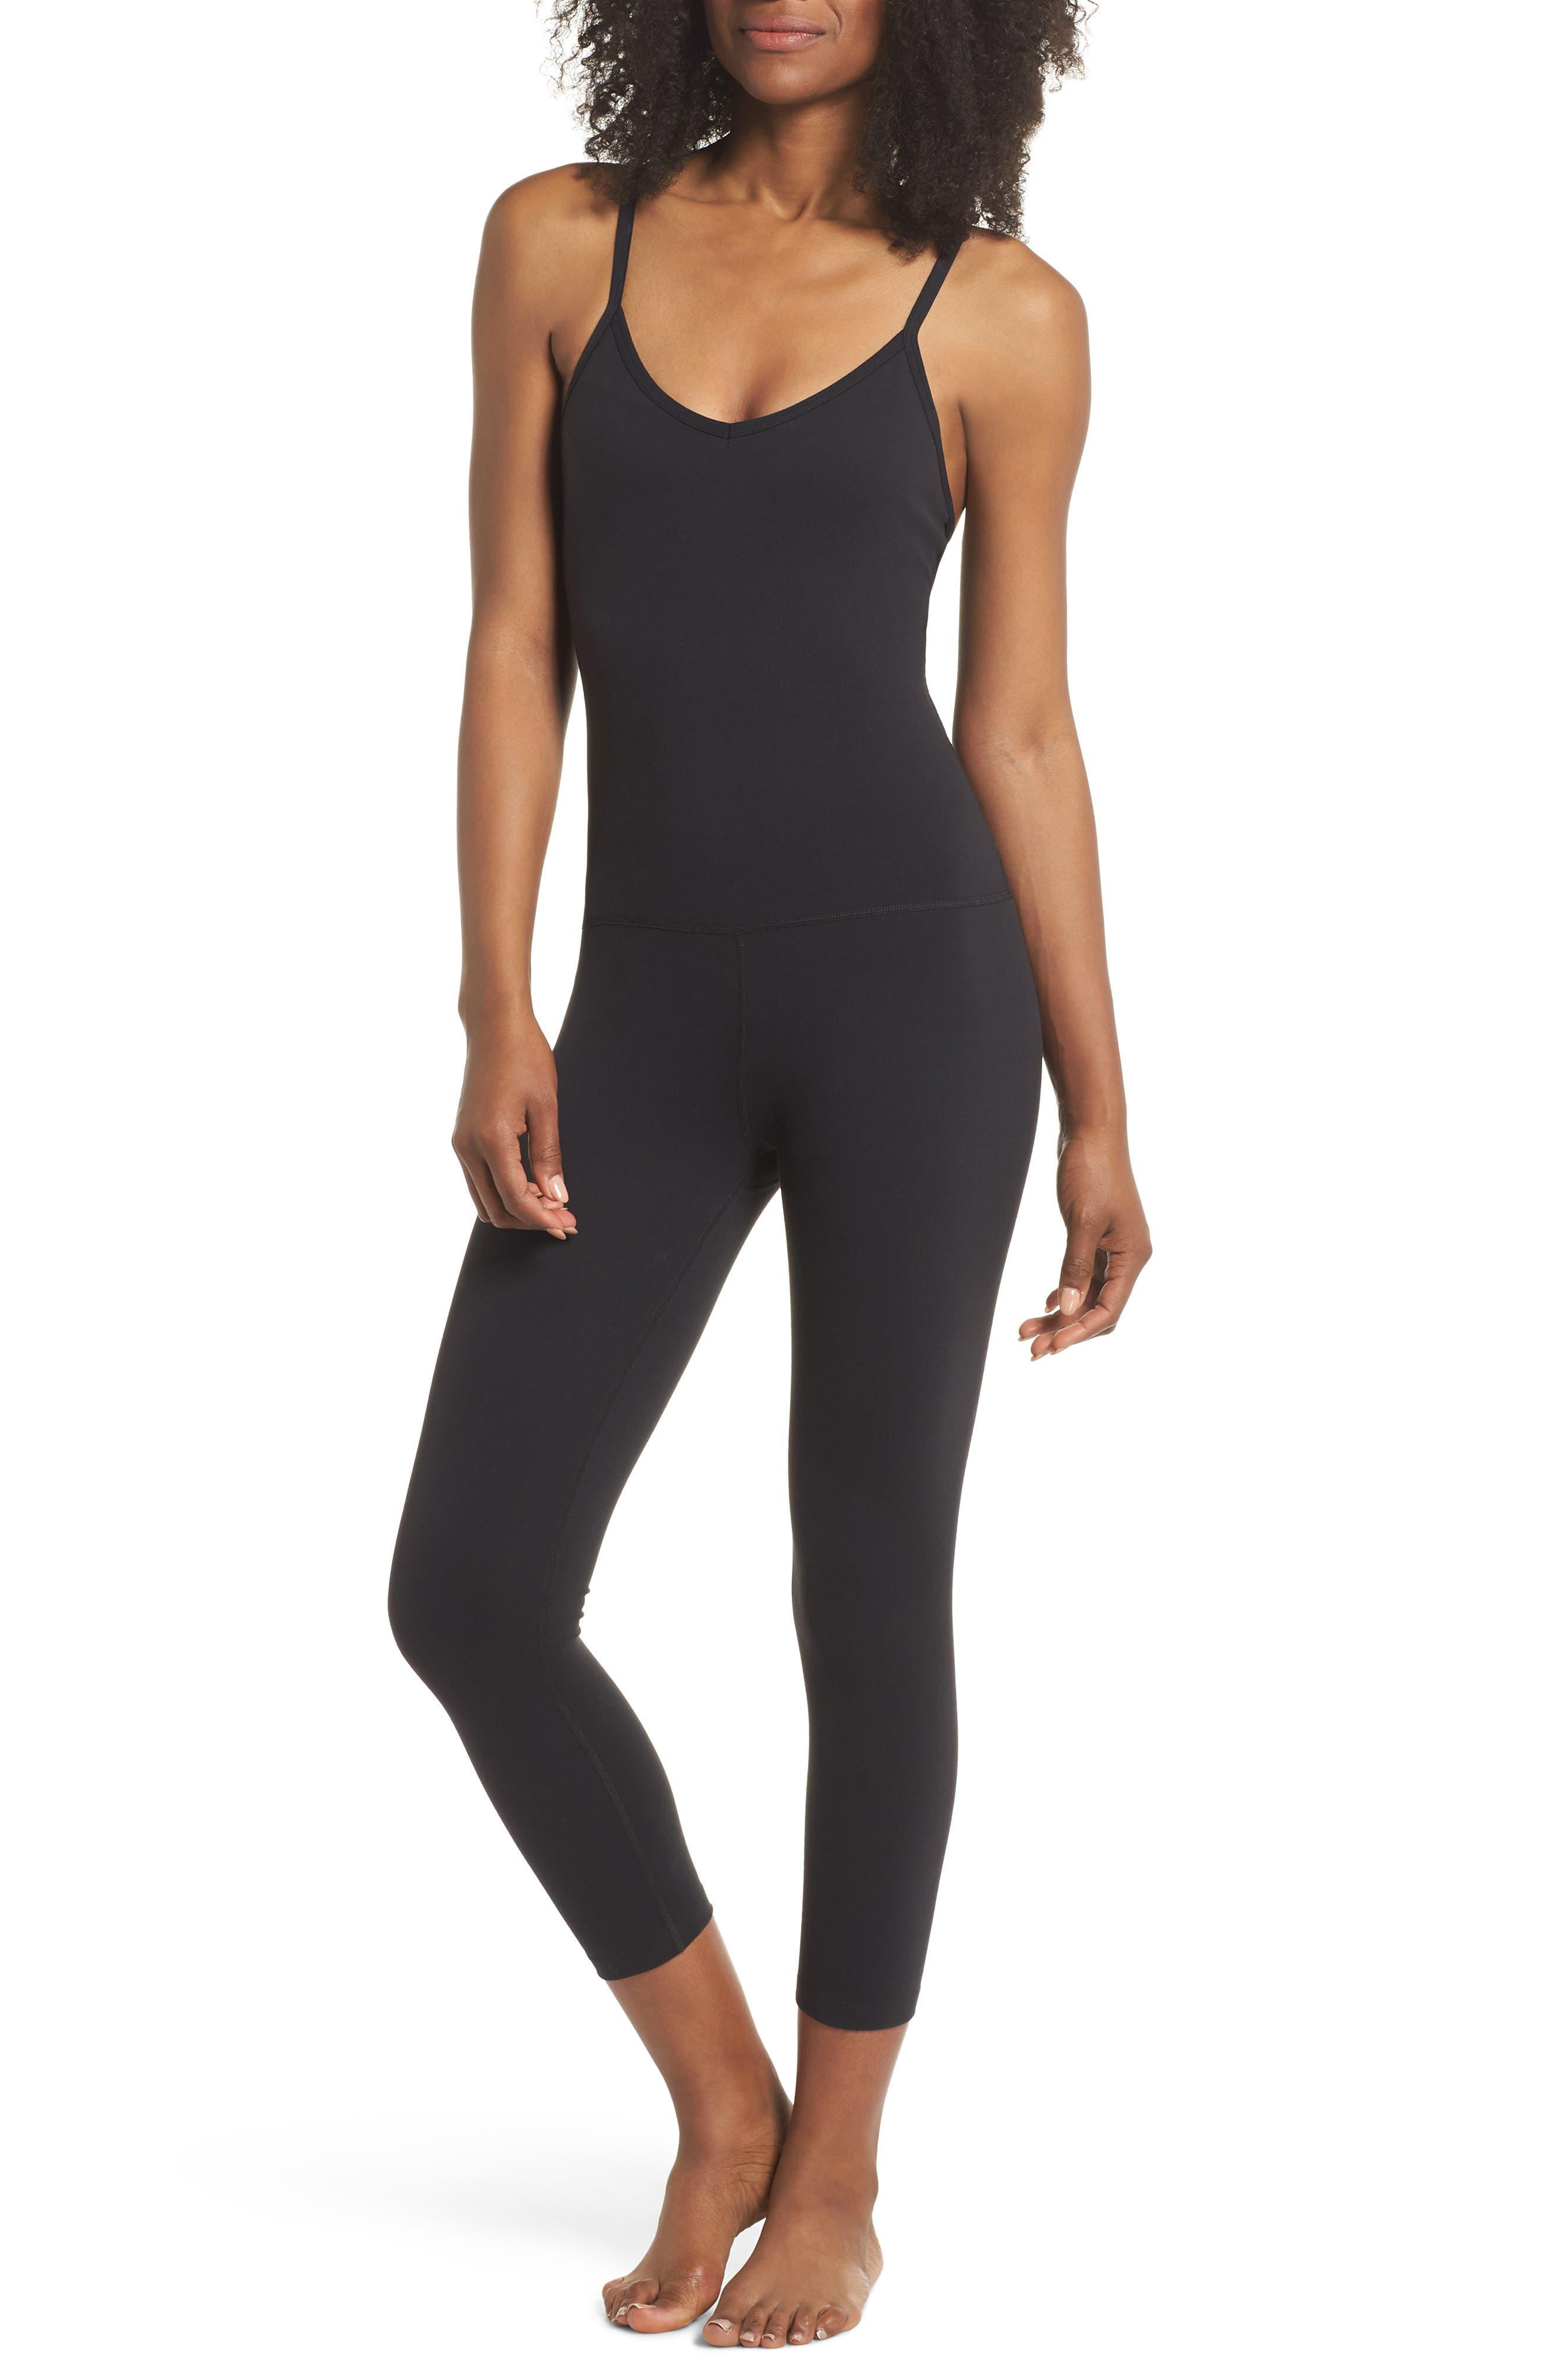 Main Image - Beyond Yoga Levels Shelf Bra Bodysuit